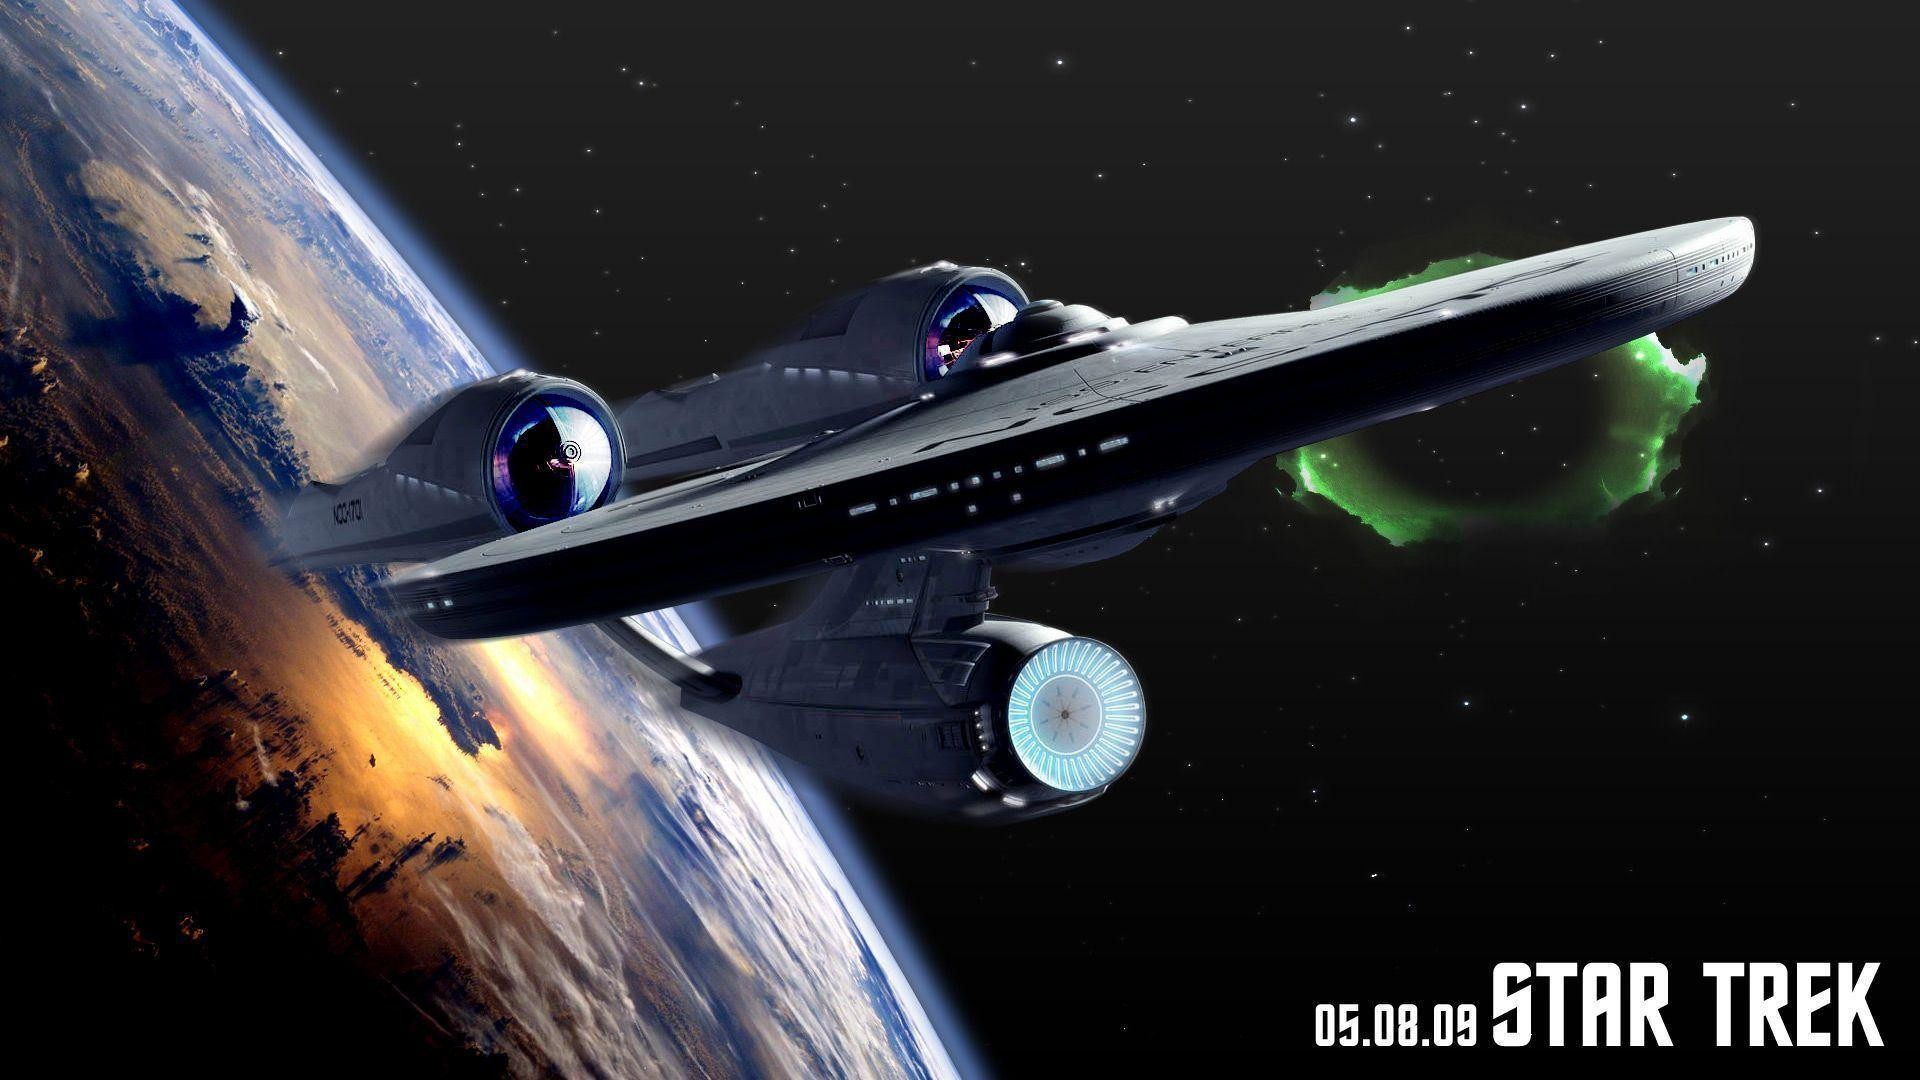 Star Trek Wallpaper HD 1